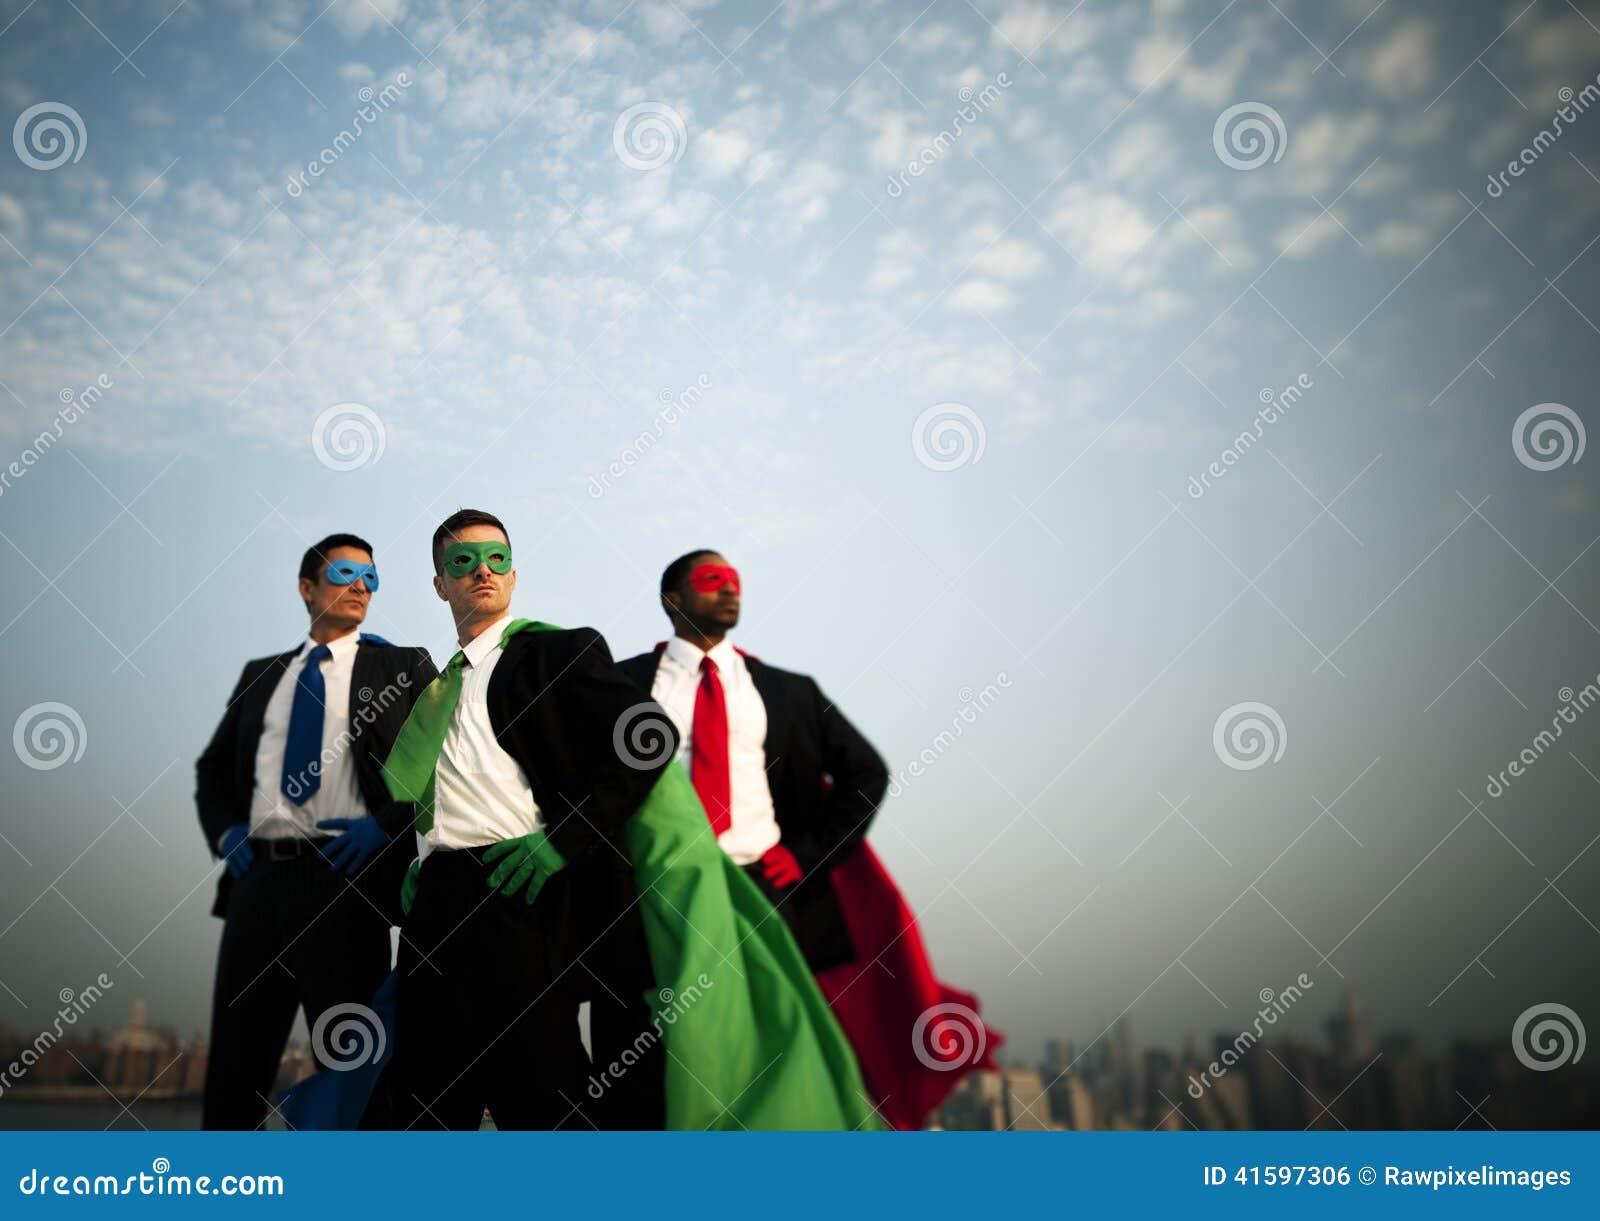 Business Superheroes at City Skyline